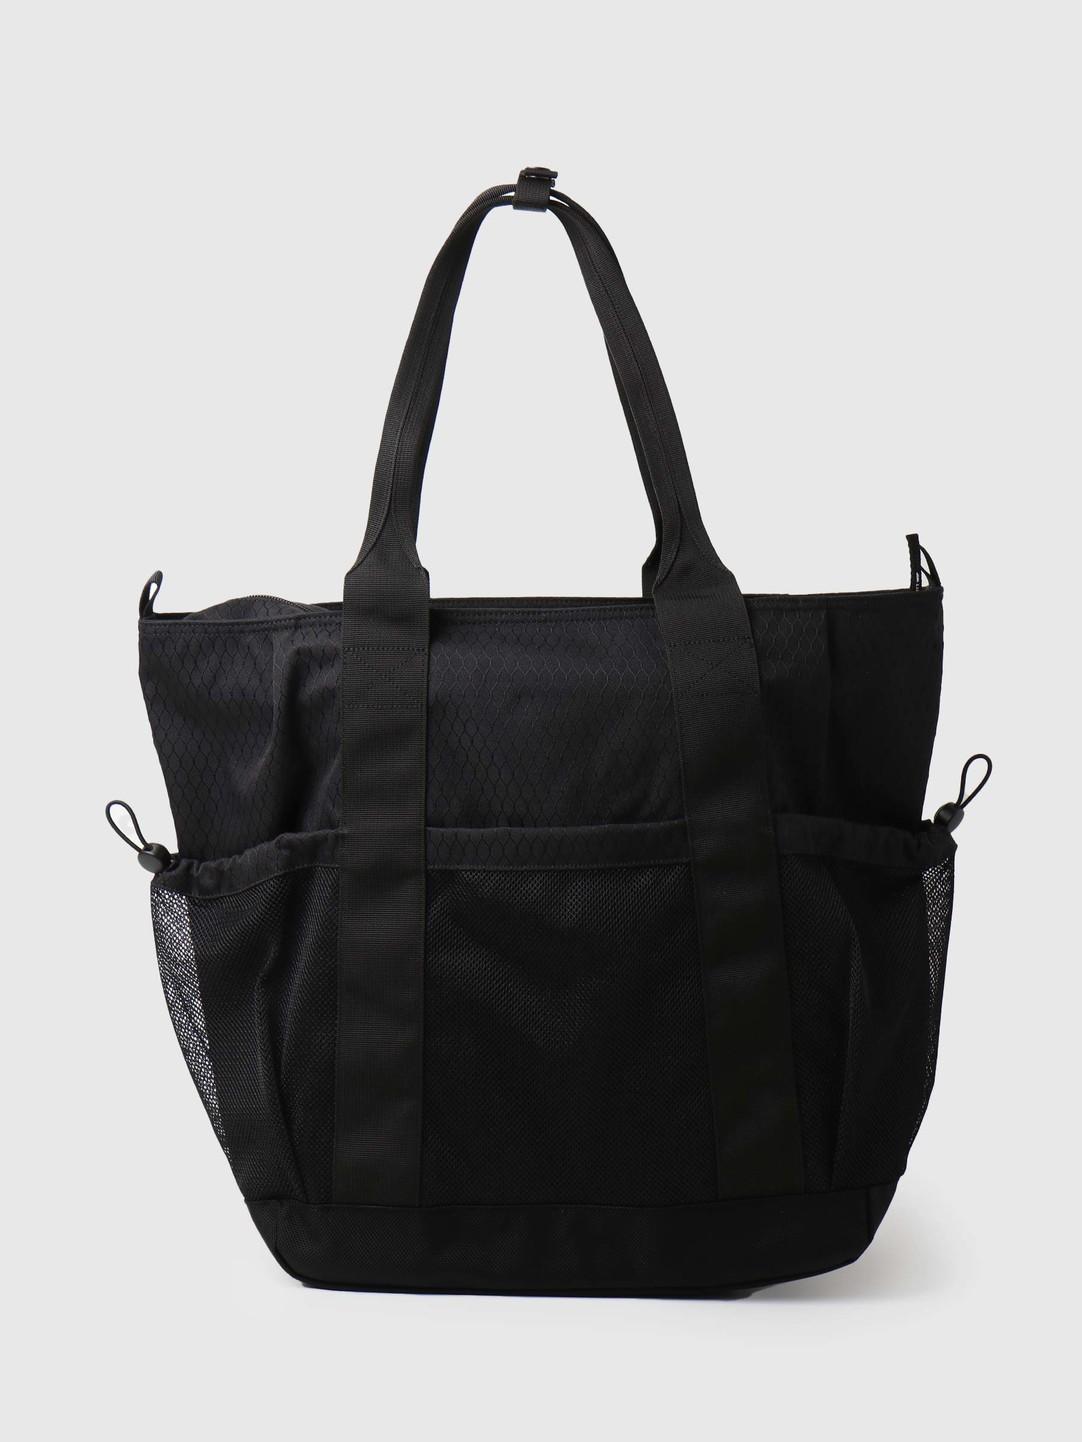 Carhartt WIP Carhartt WIP Spey Tote Bag Black Black I028888-8900